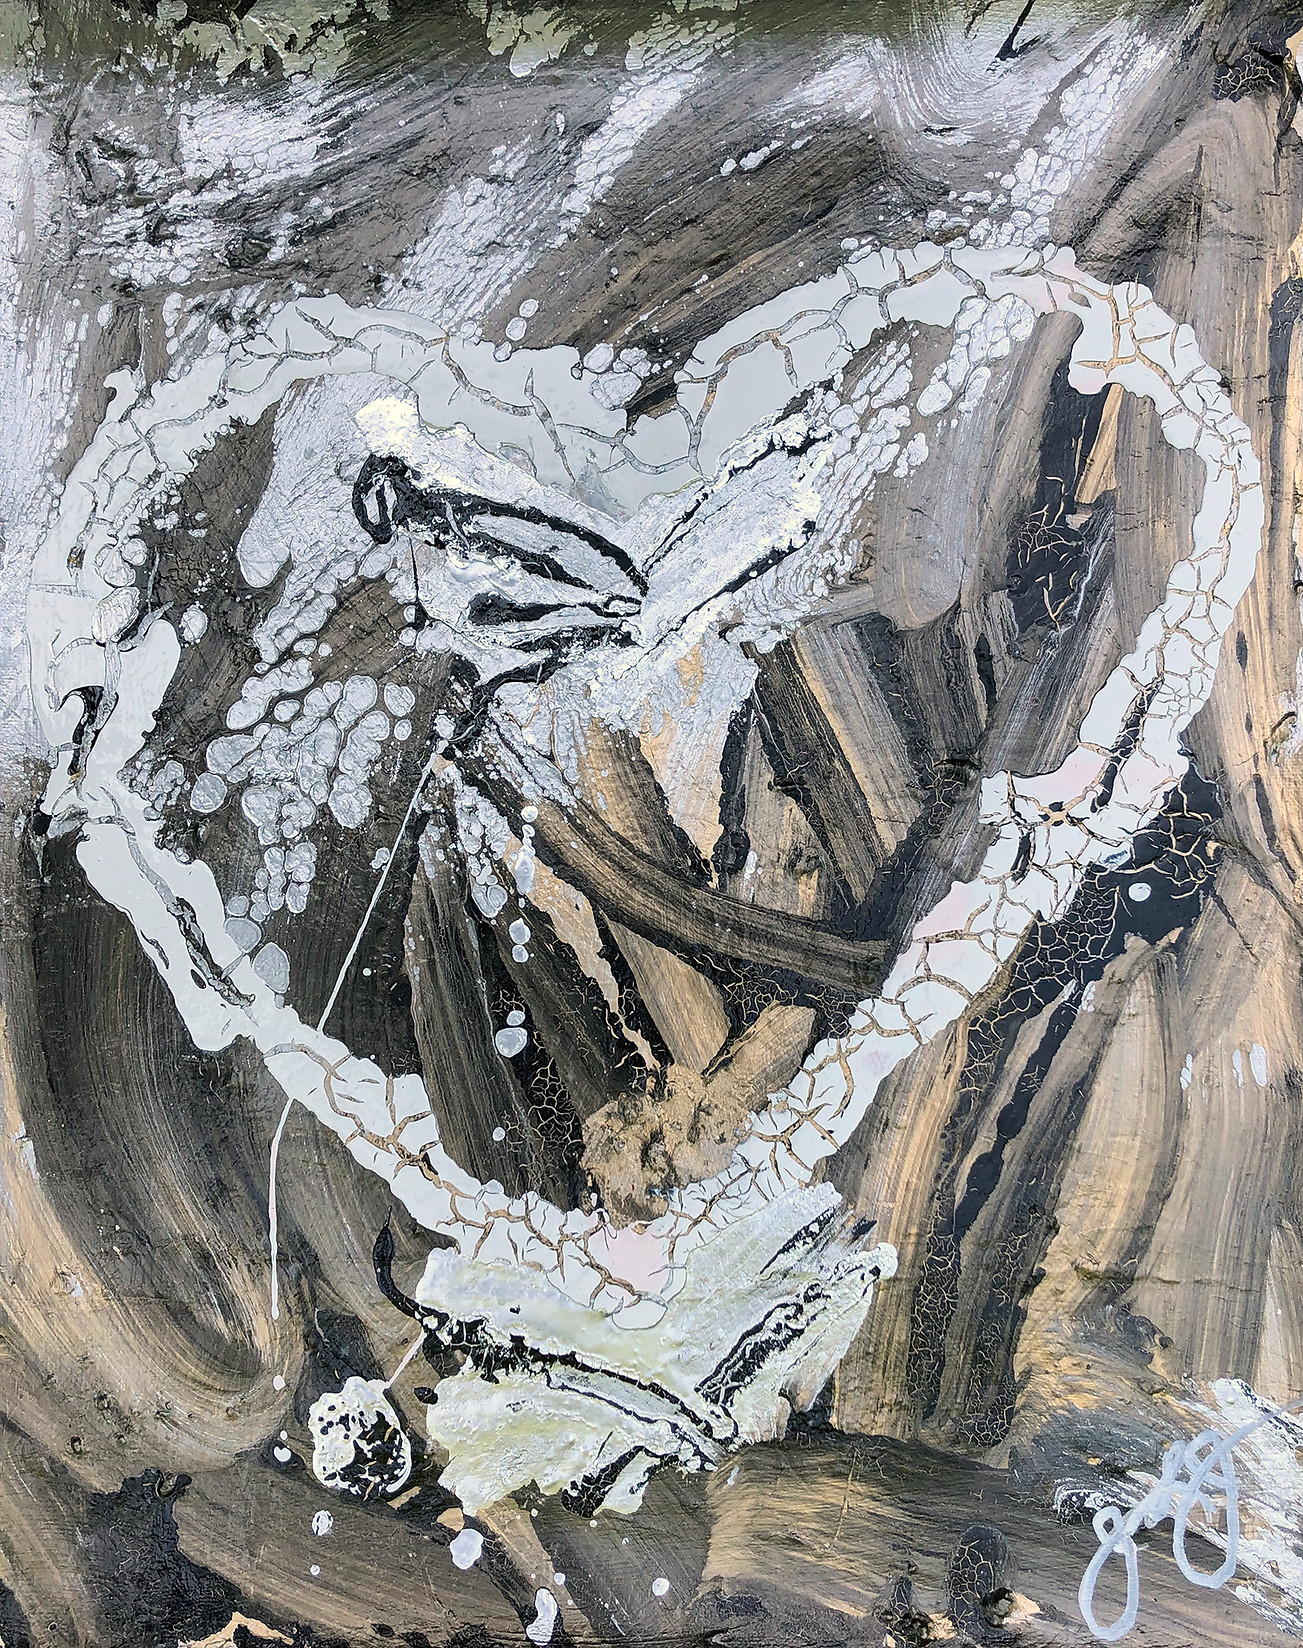 essen's heart 24.jpg